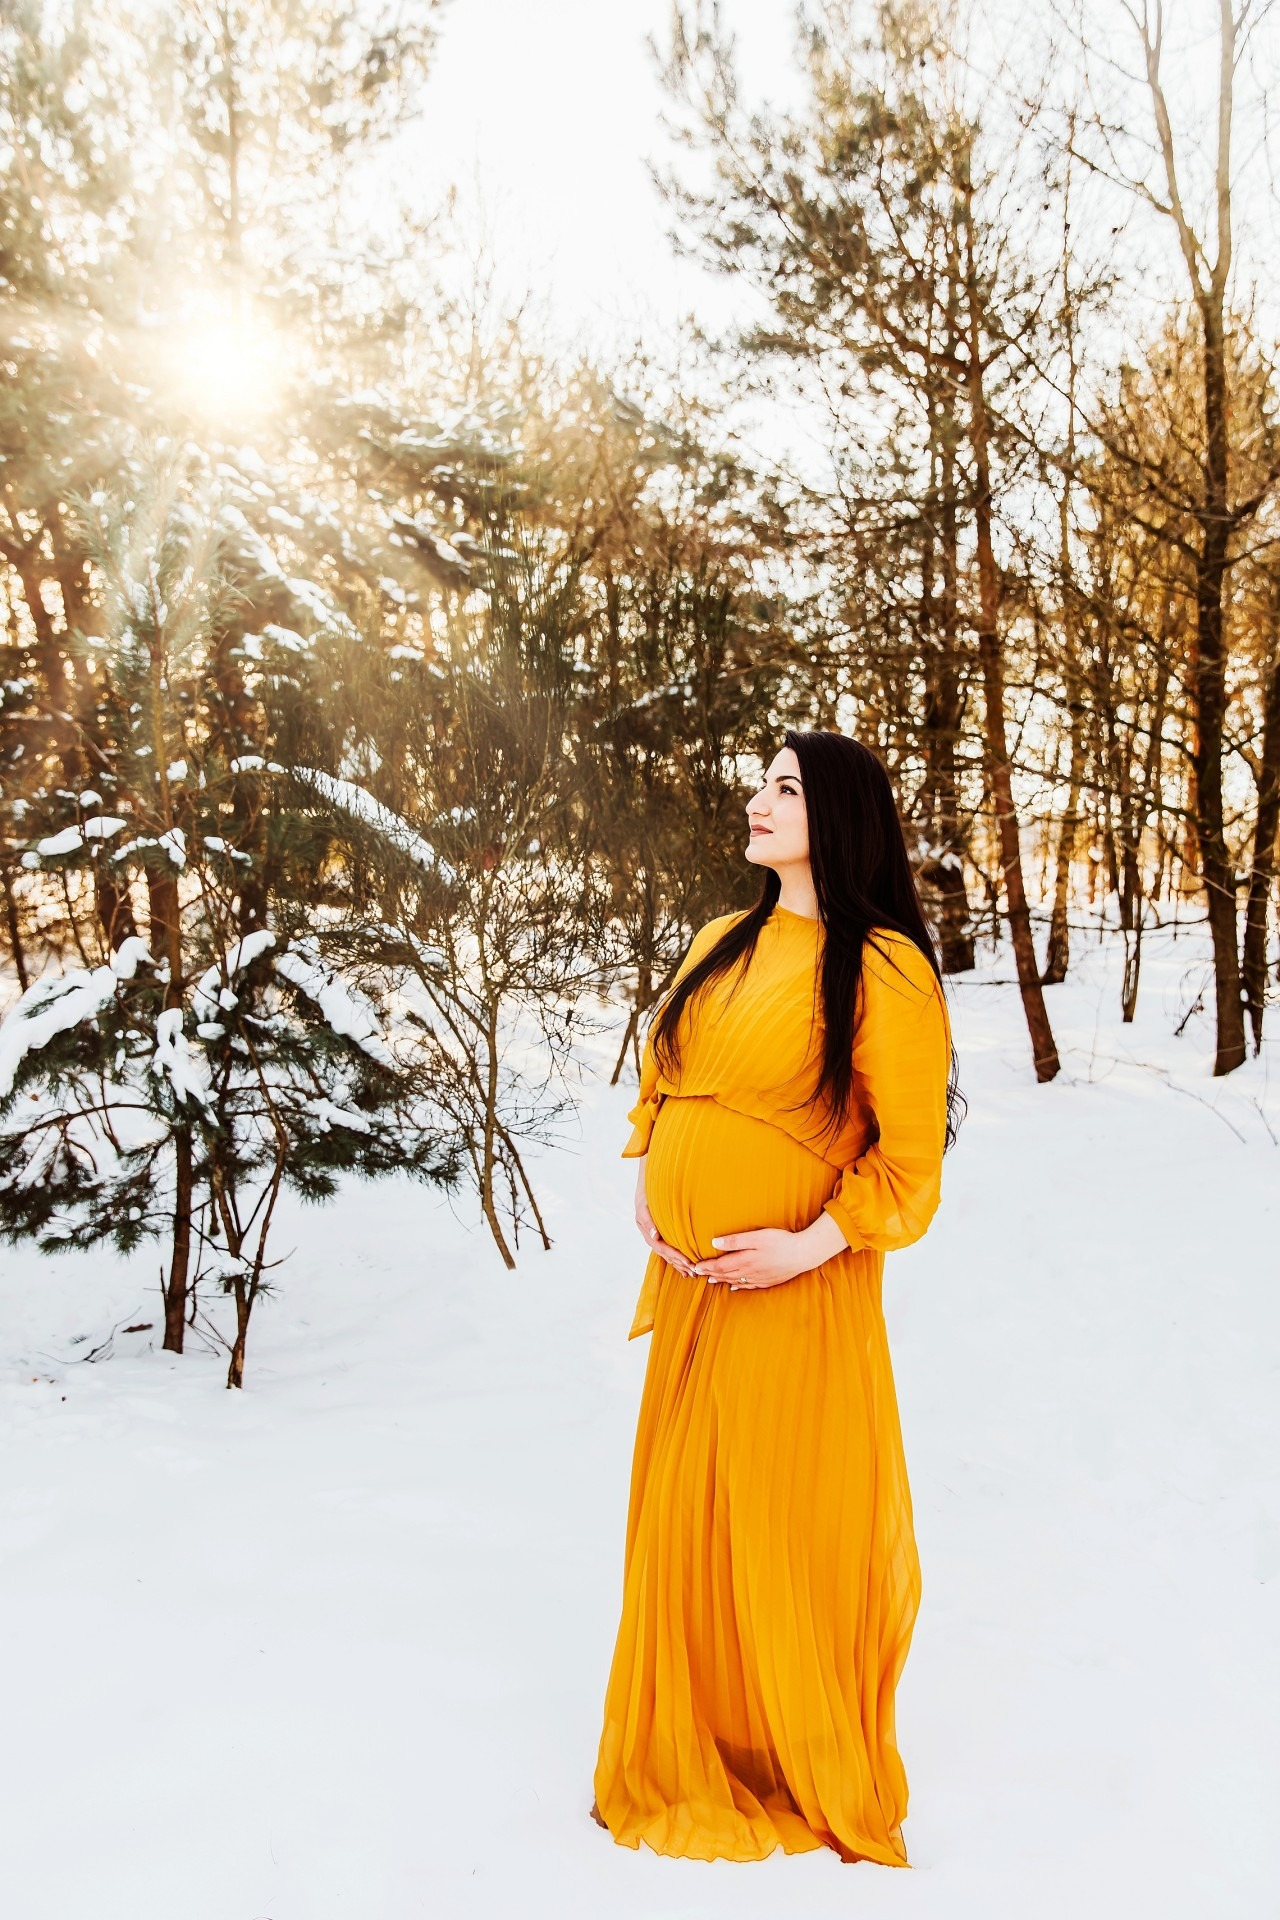 Zwangerschapsfotografie Nijmegen | Cuijk, Elainefotografie